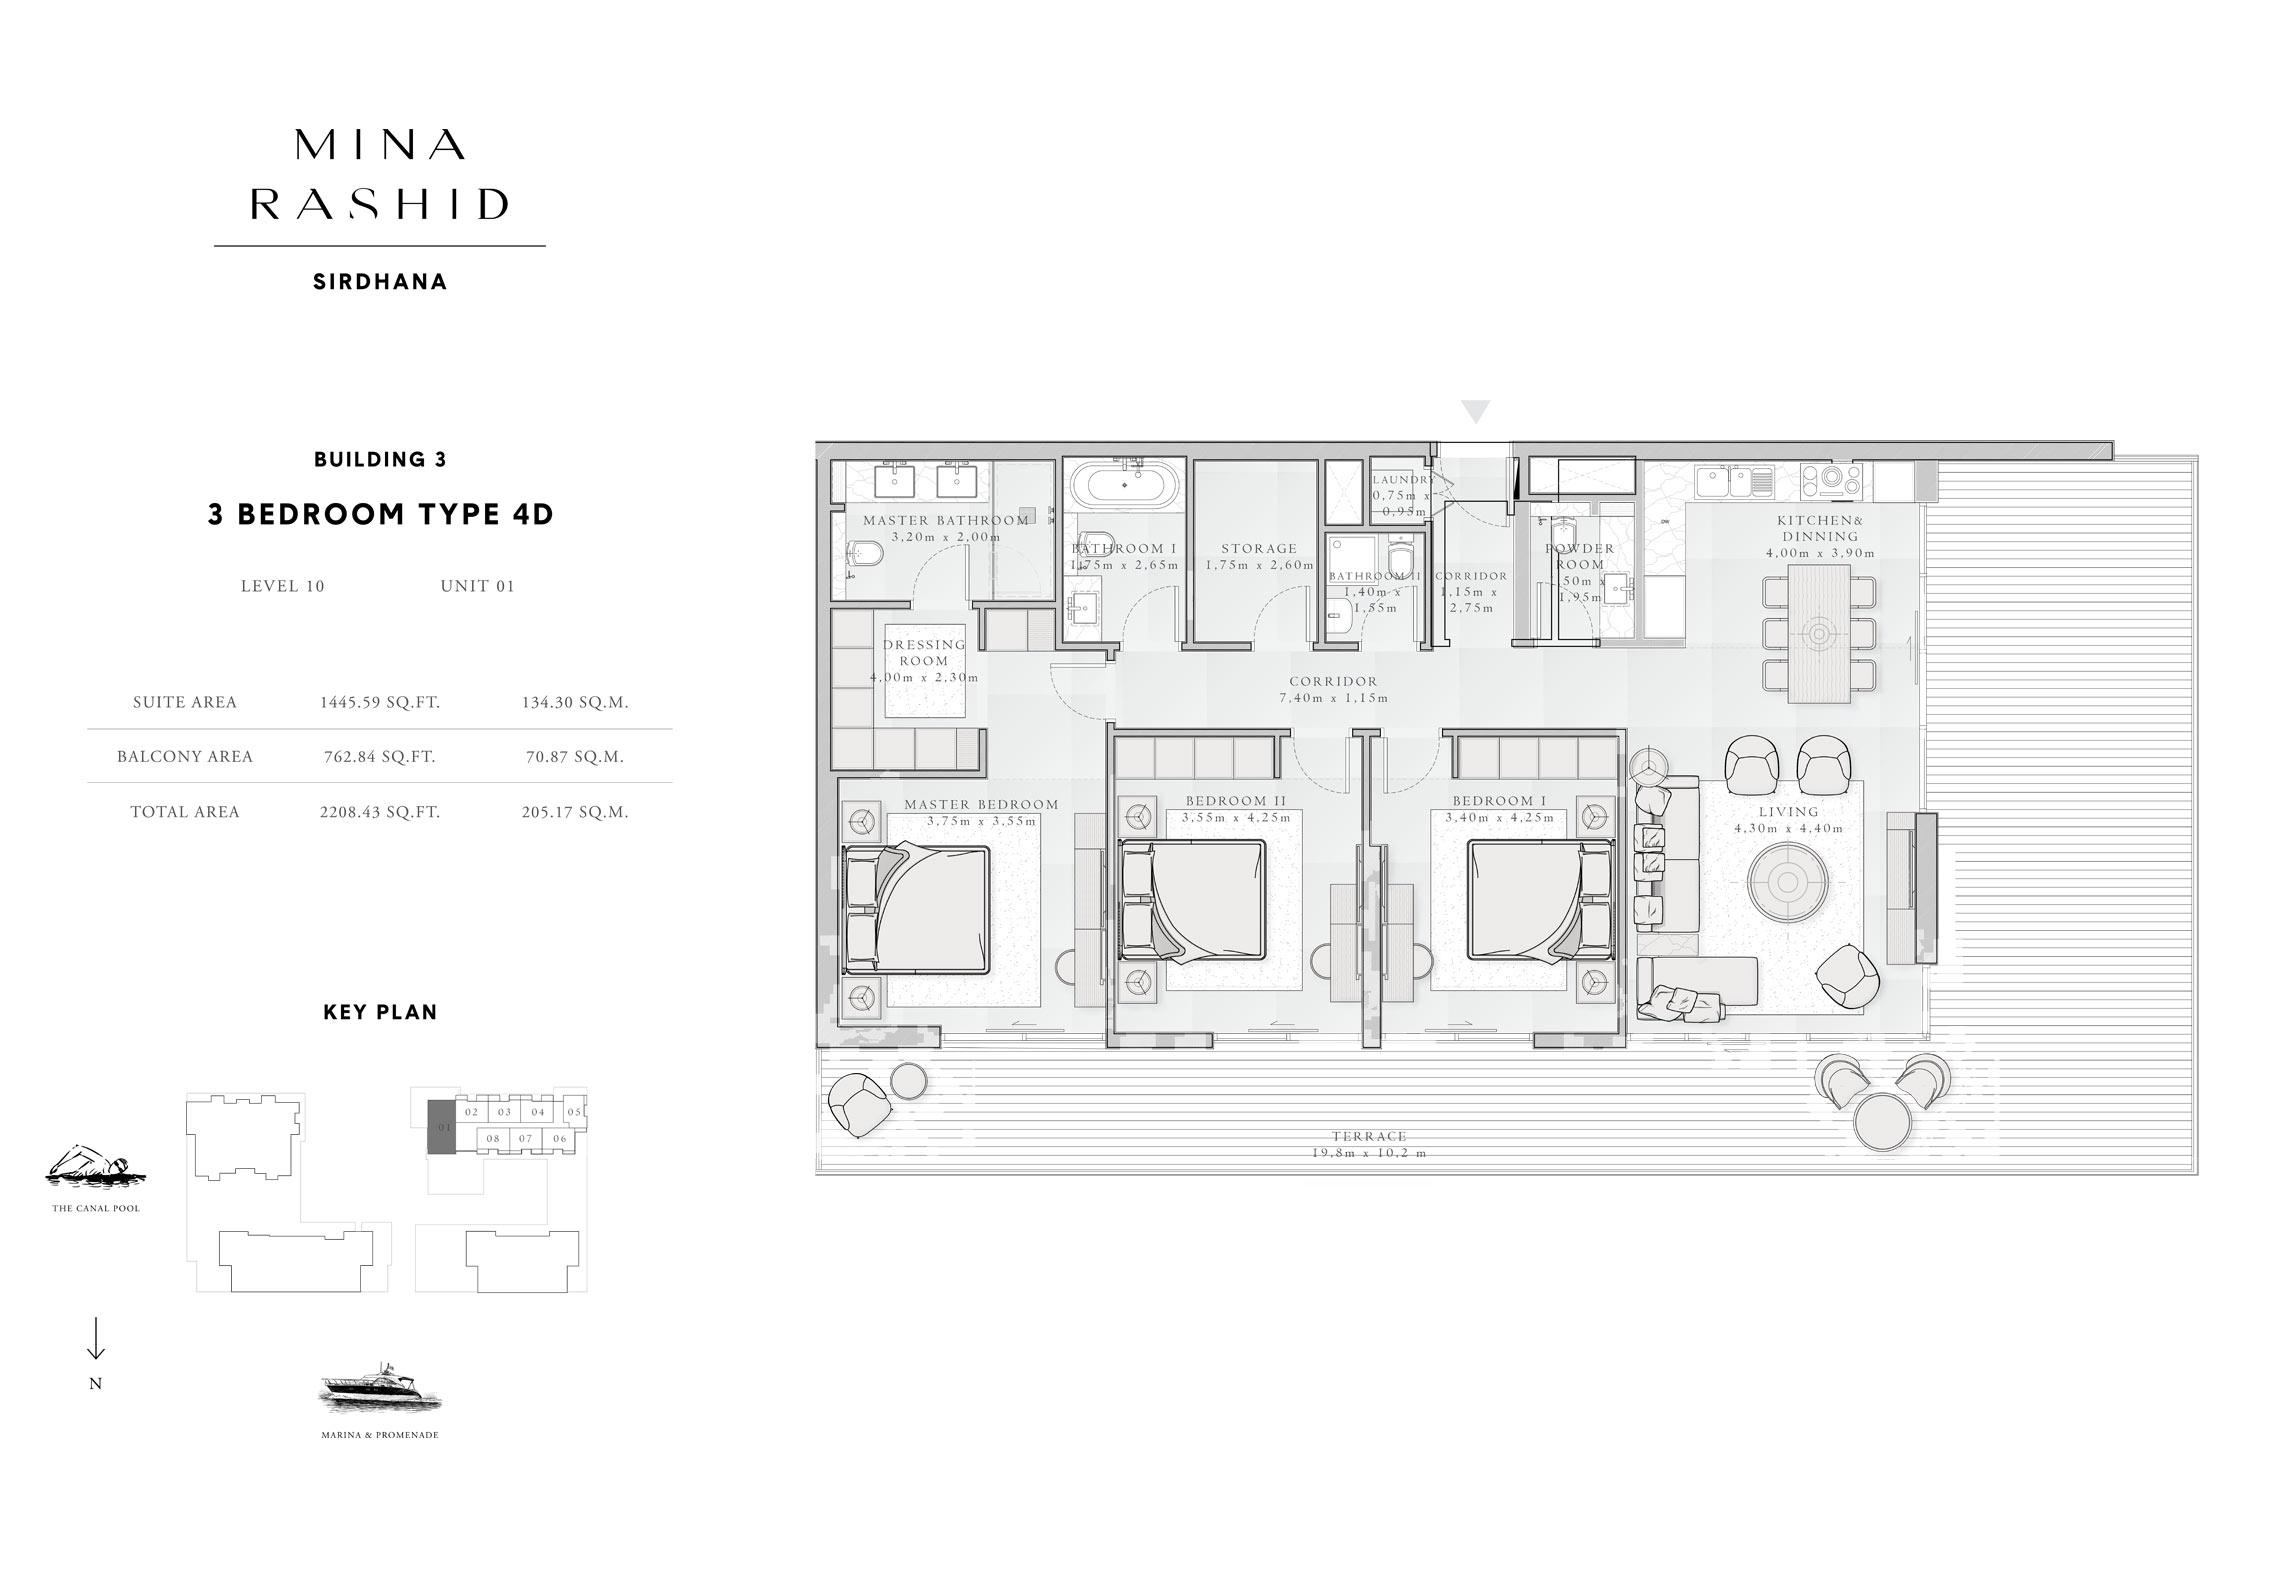 3-Bedroom-Type-4D, Building-4, Level-10, Size-2208-Sq-Ft